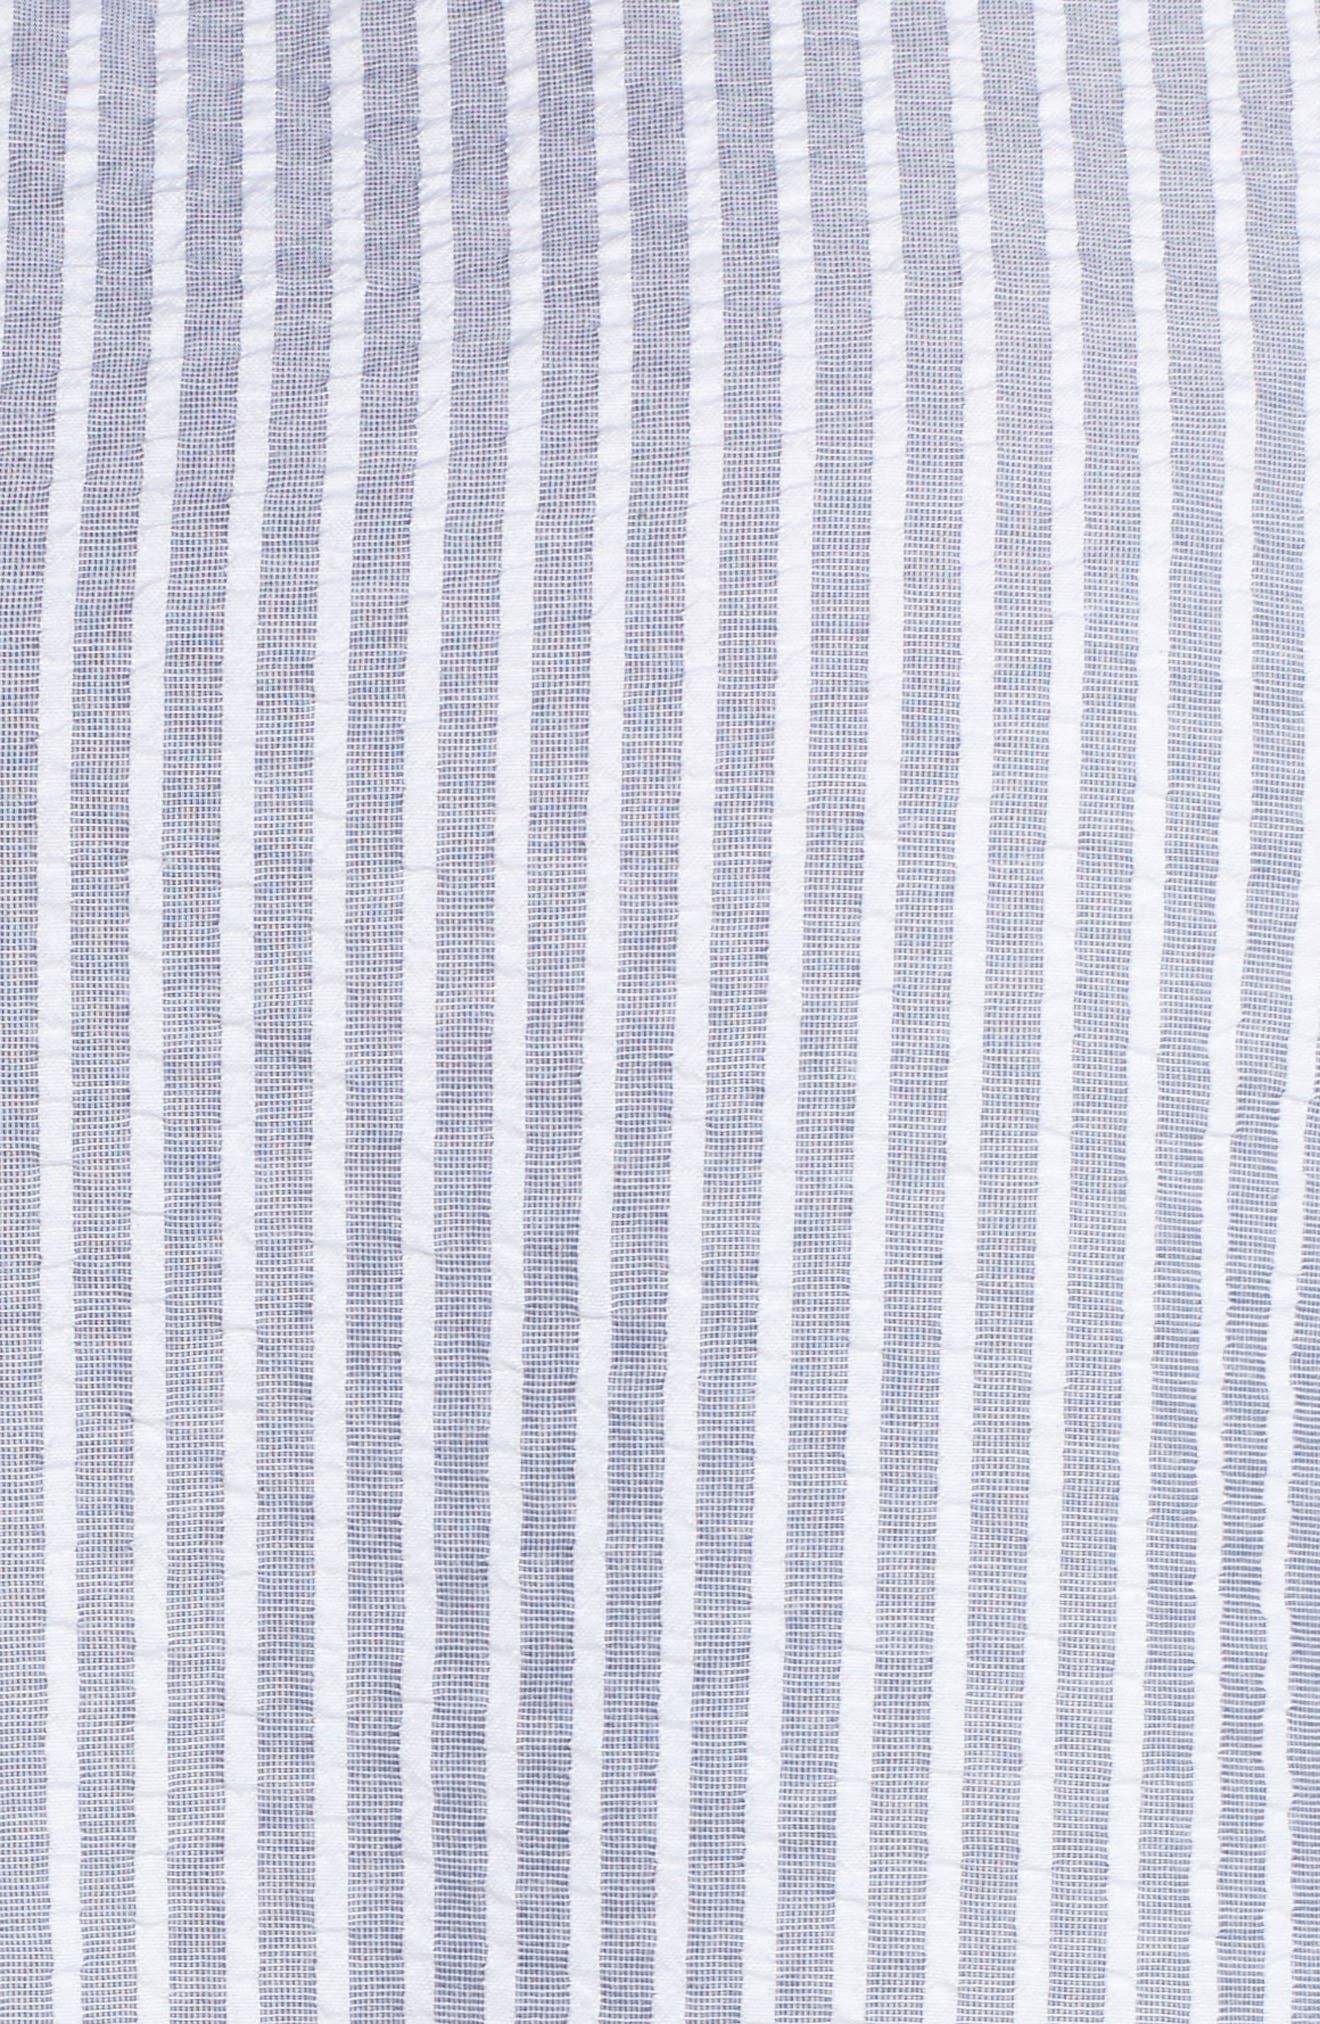 Ticking Stripe Ruffle Top,                             Alternate thumbnail 5, color,                             060